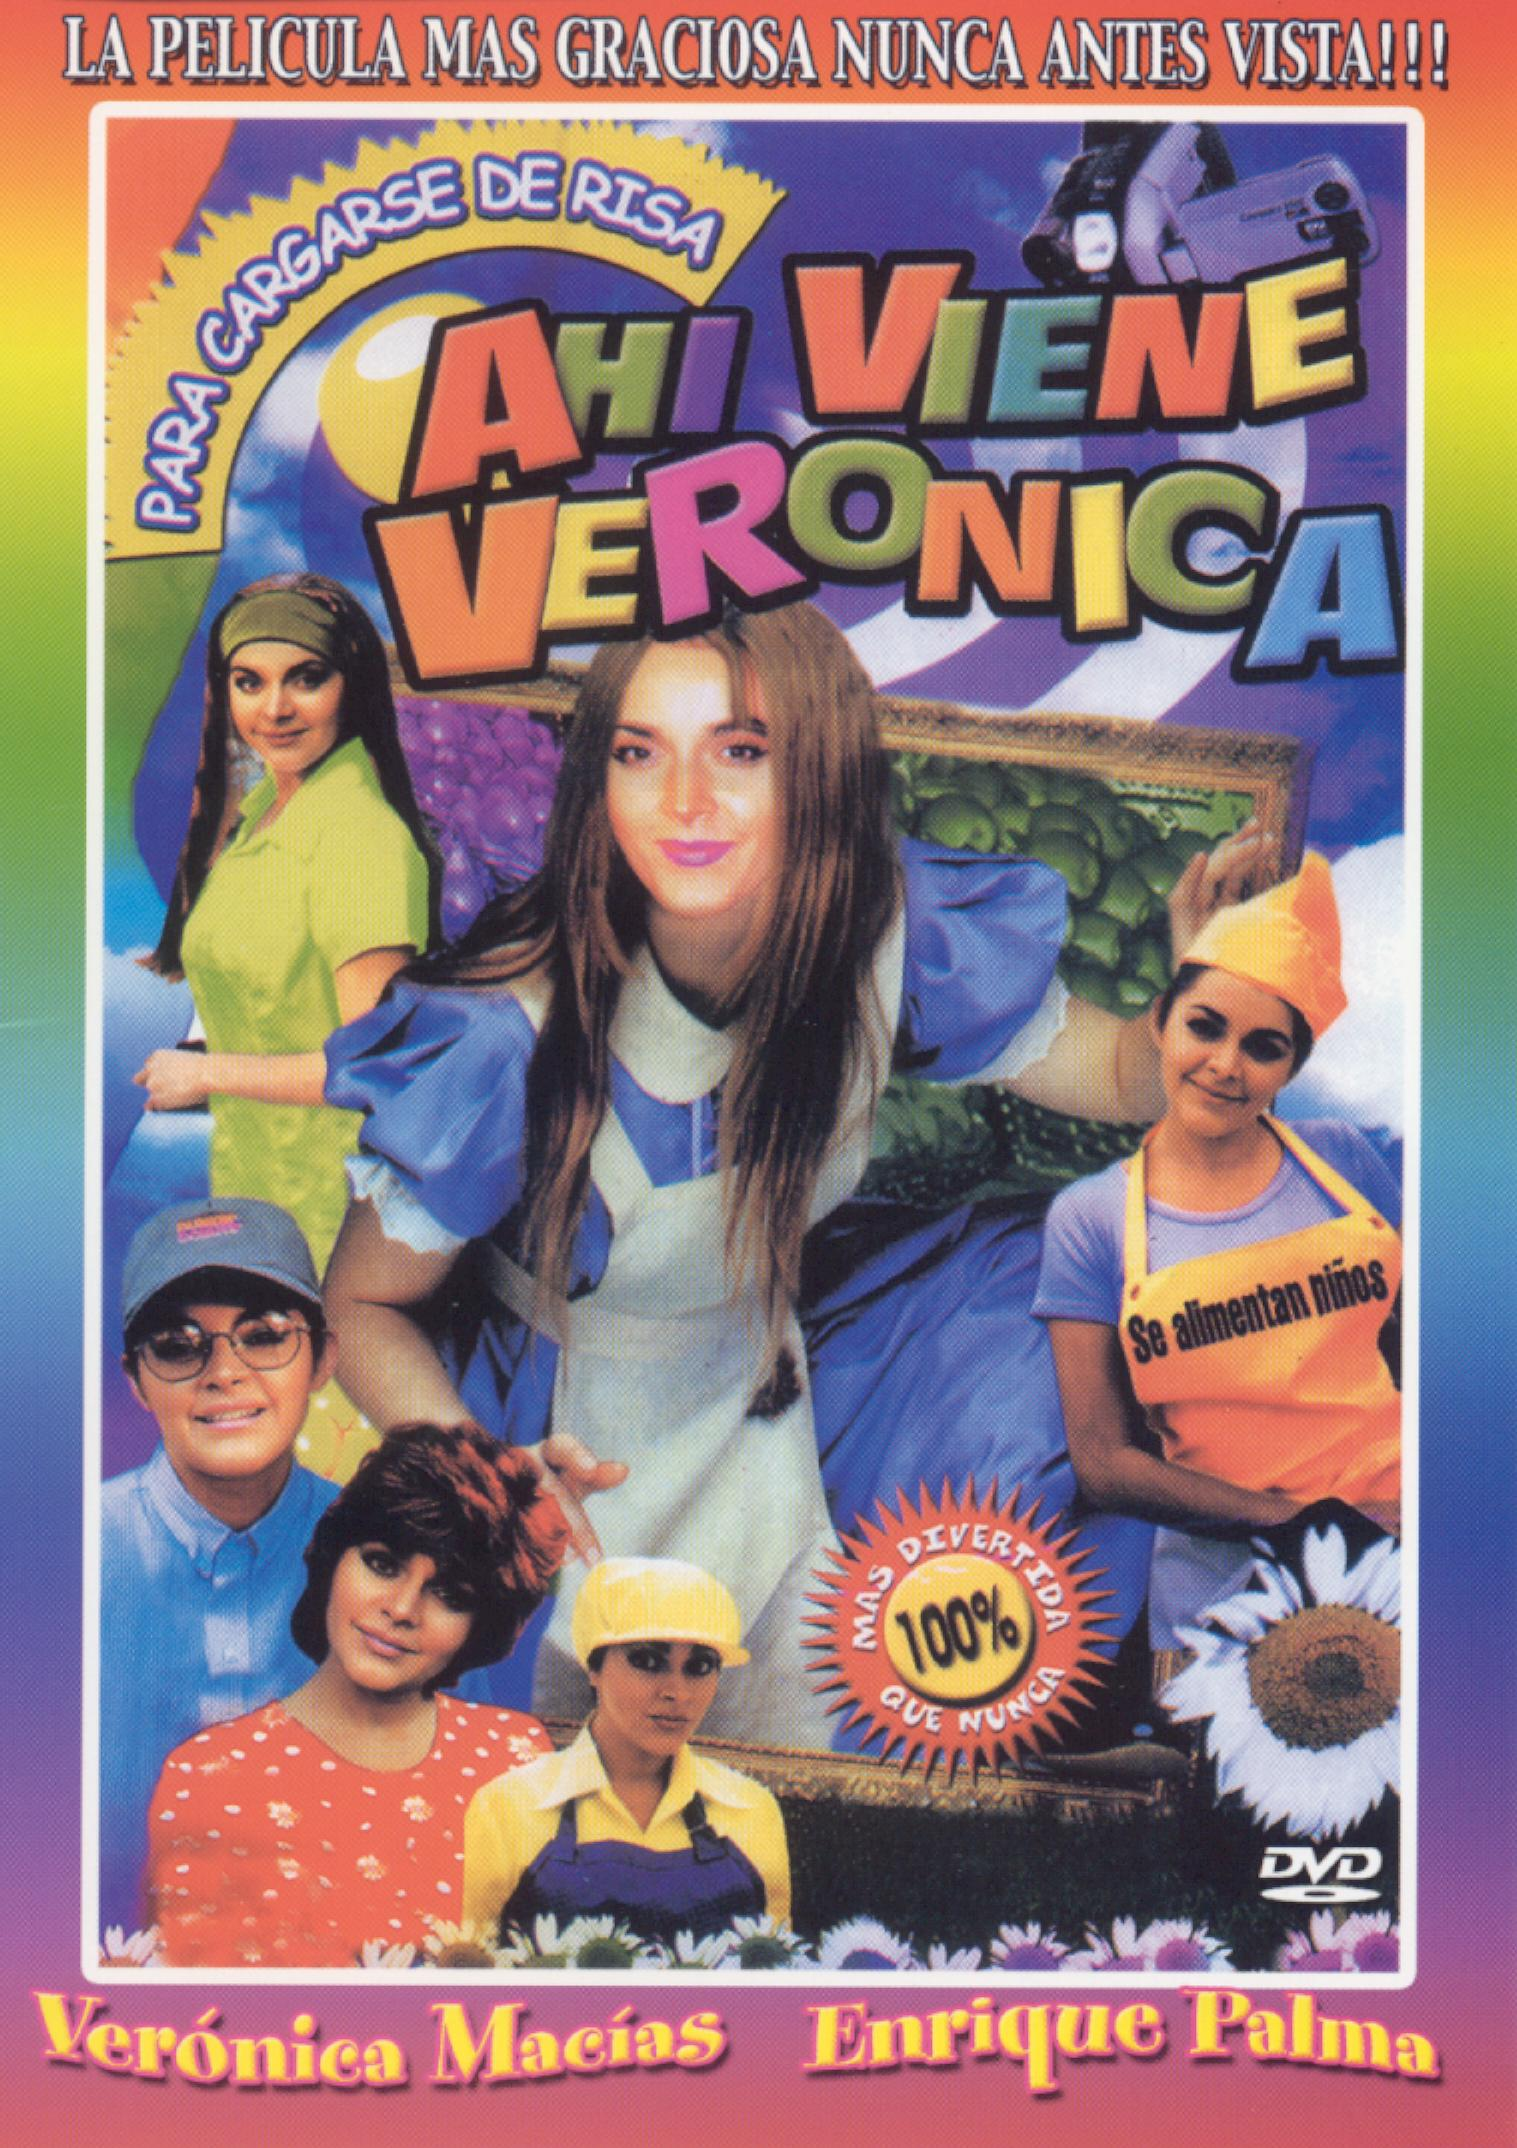 Ahi Viene Veronica